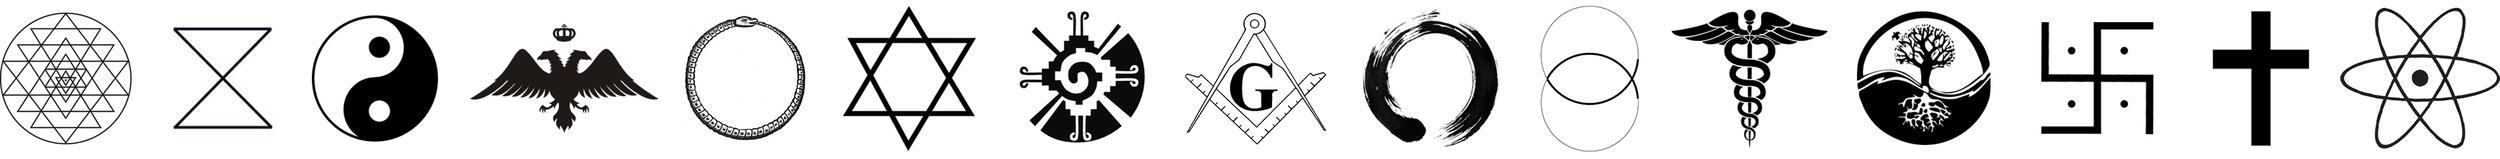 synonymous symbols